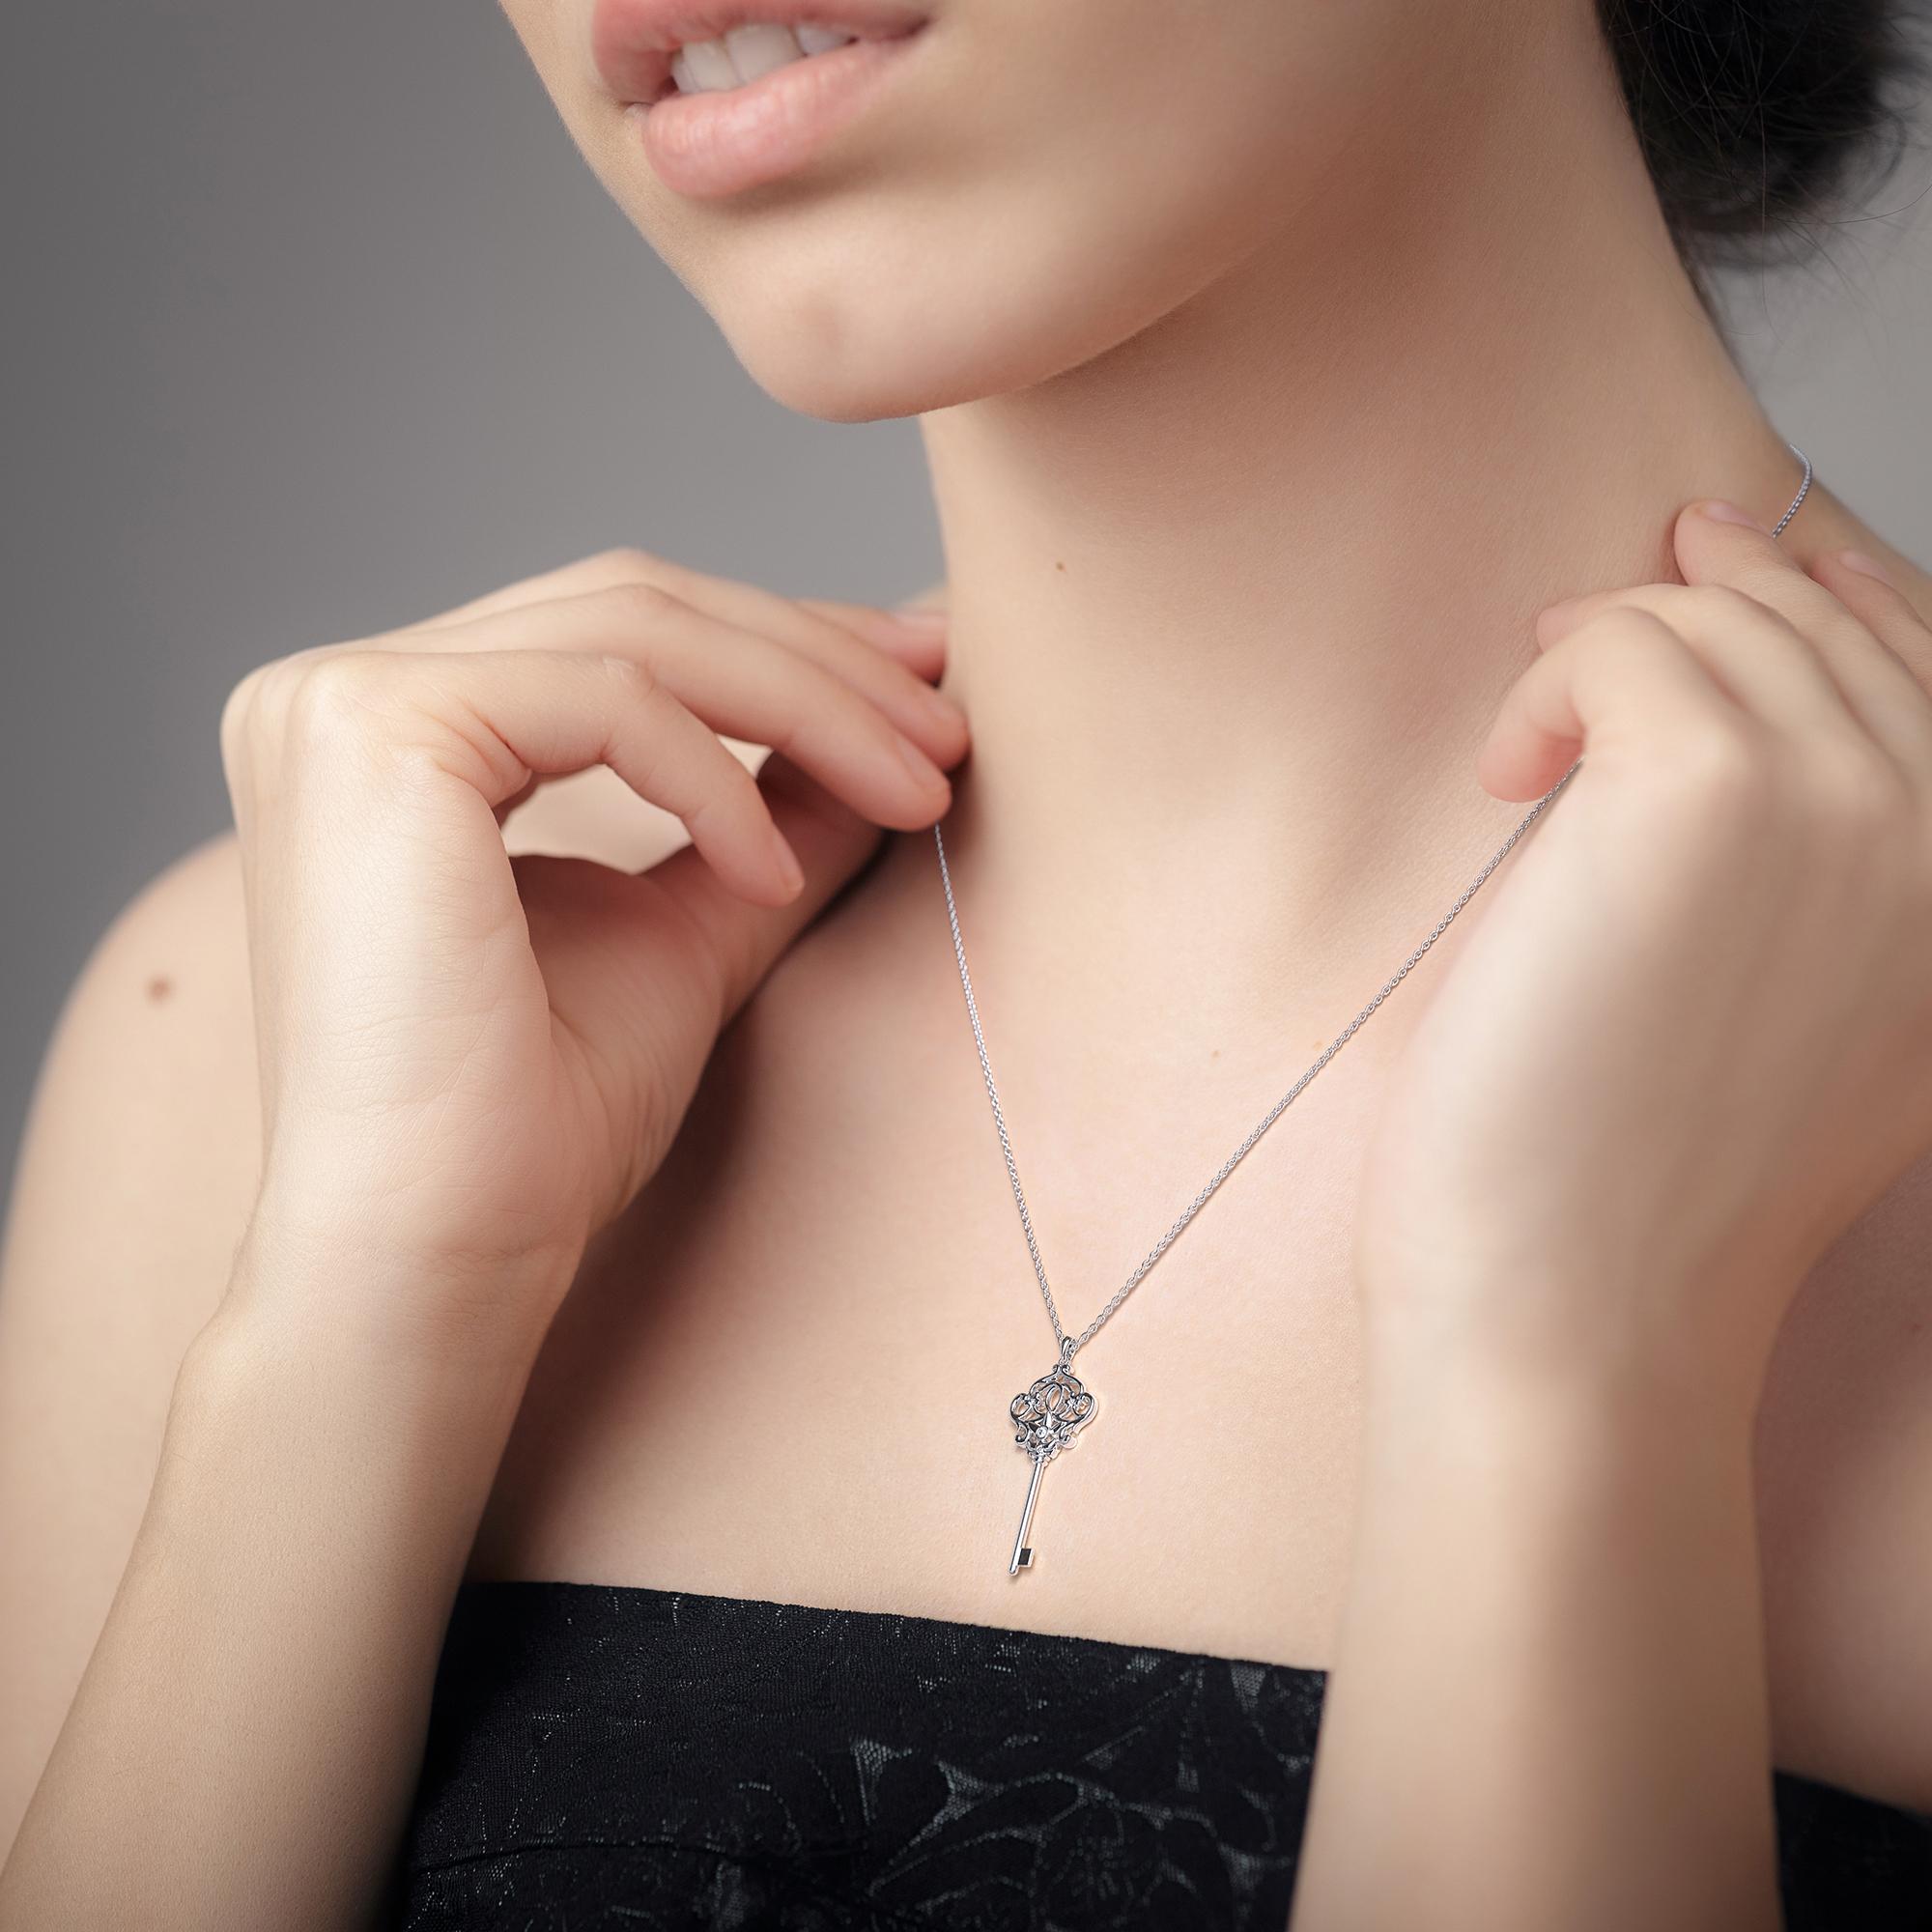 Diamond Key Pendant White Gold Necklace Art Deco Style Pendant Unique Gift For Her